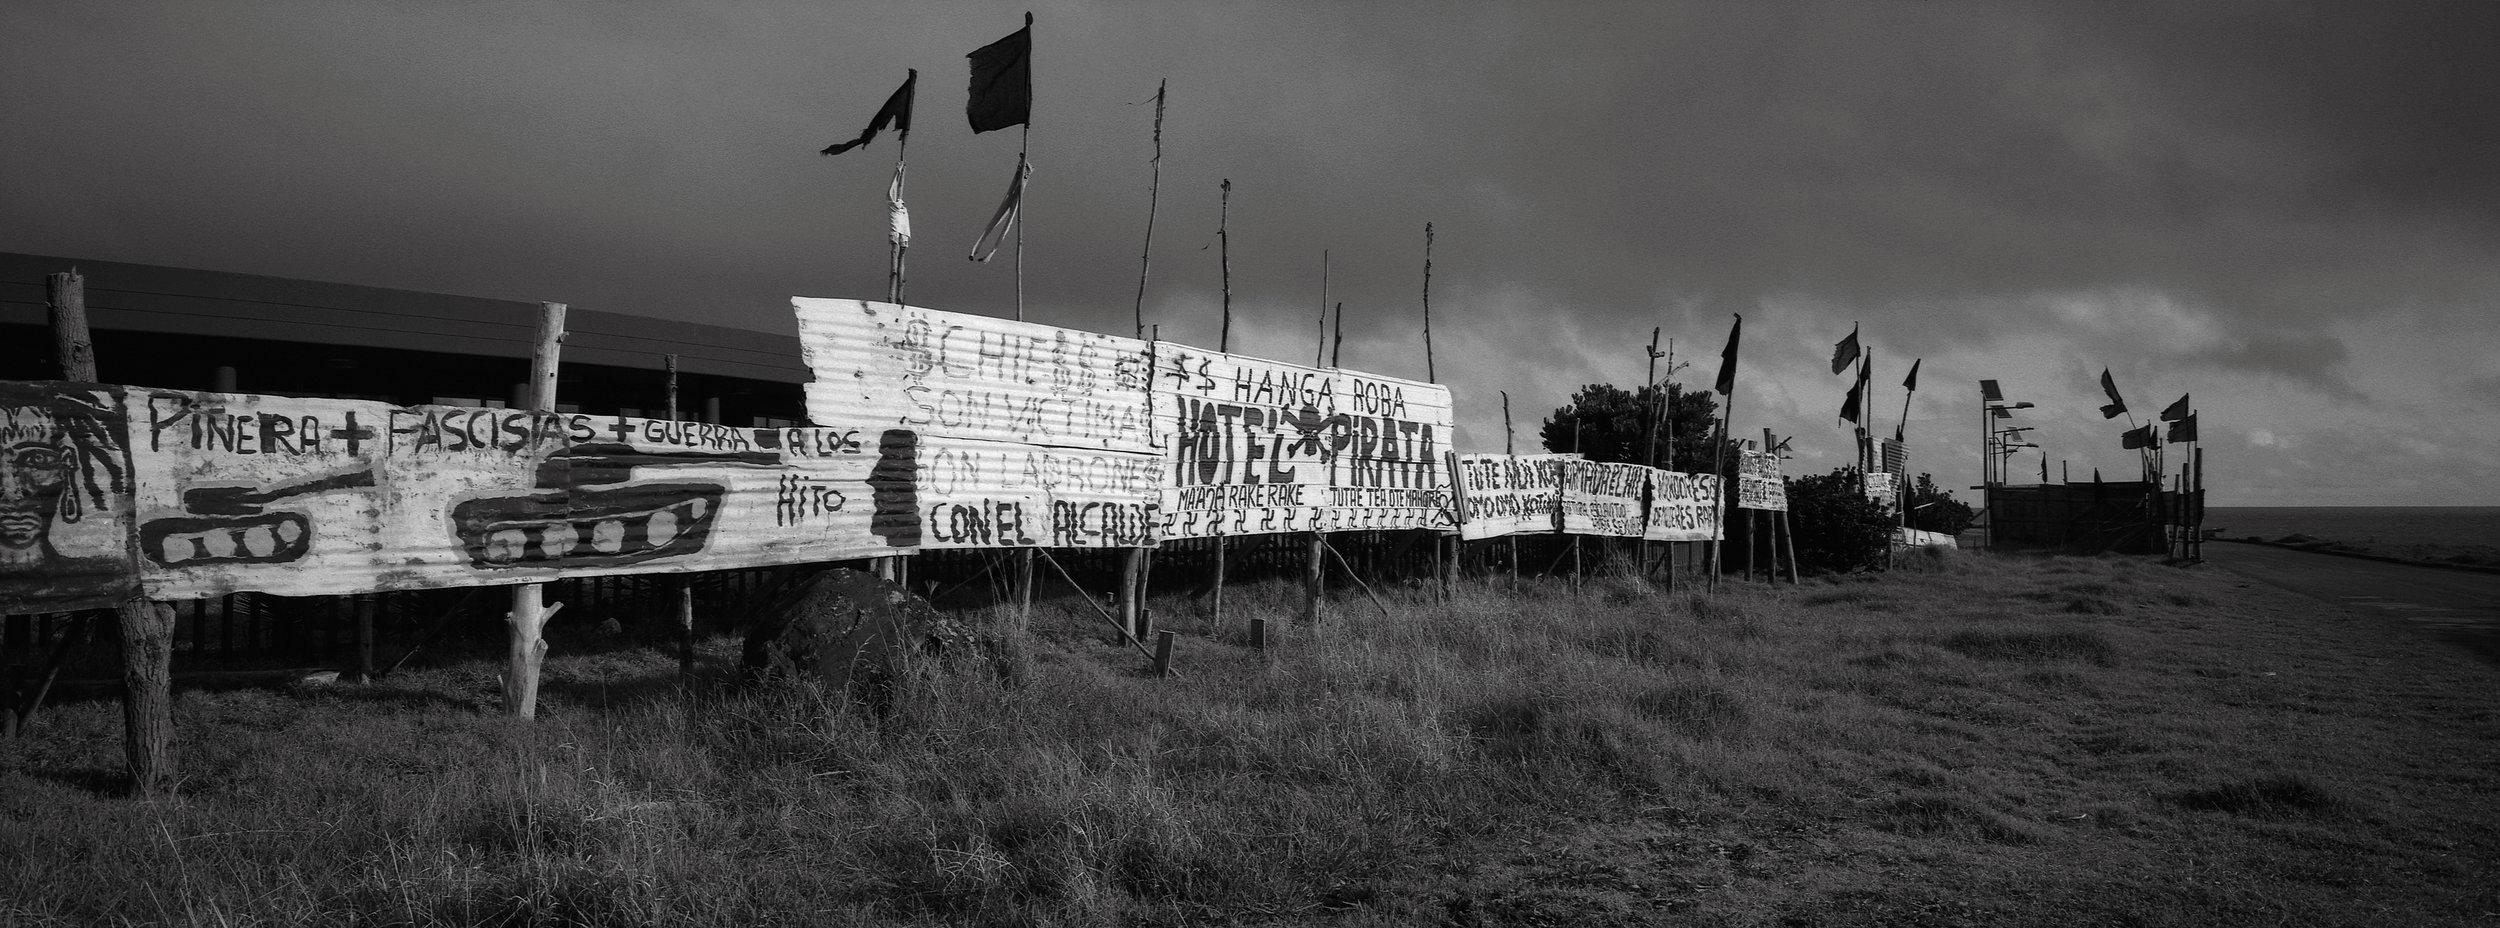 Protest, Hanga Roa, Easter Island